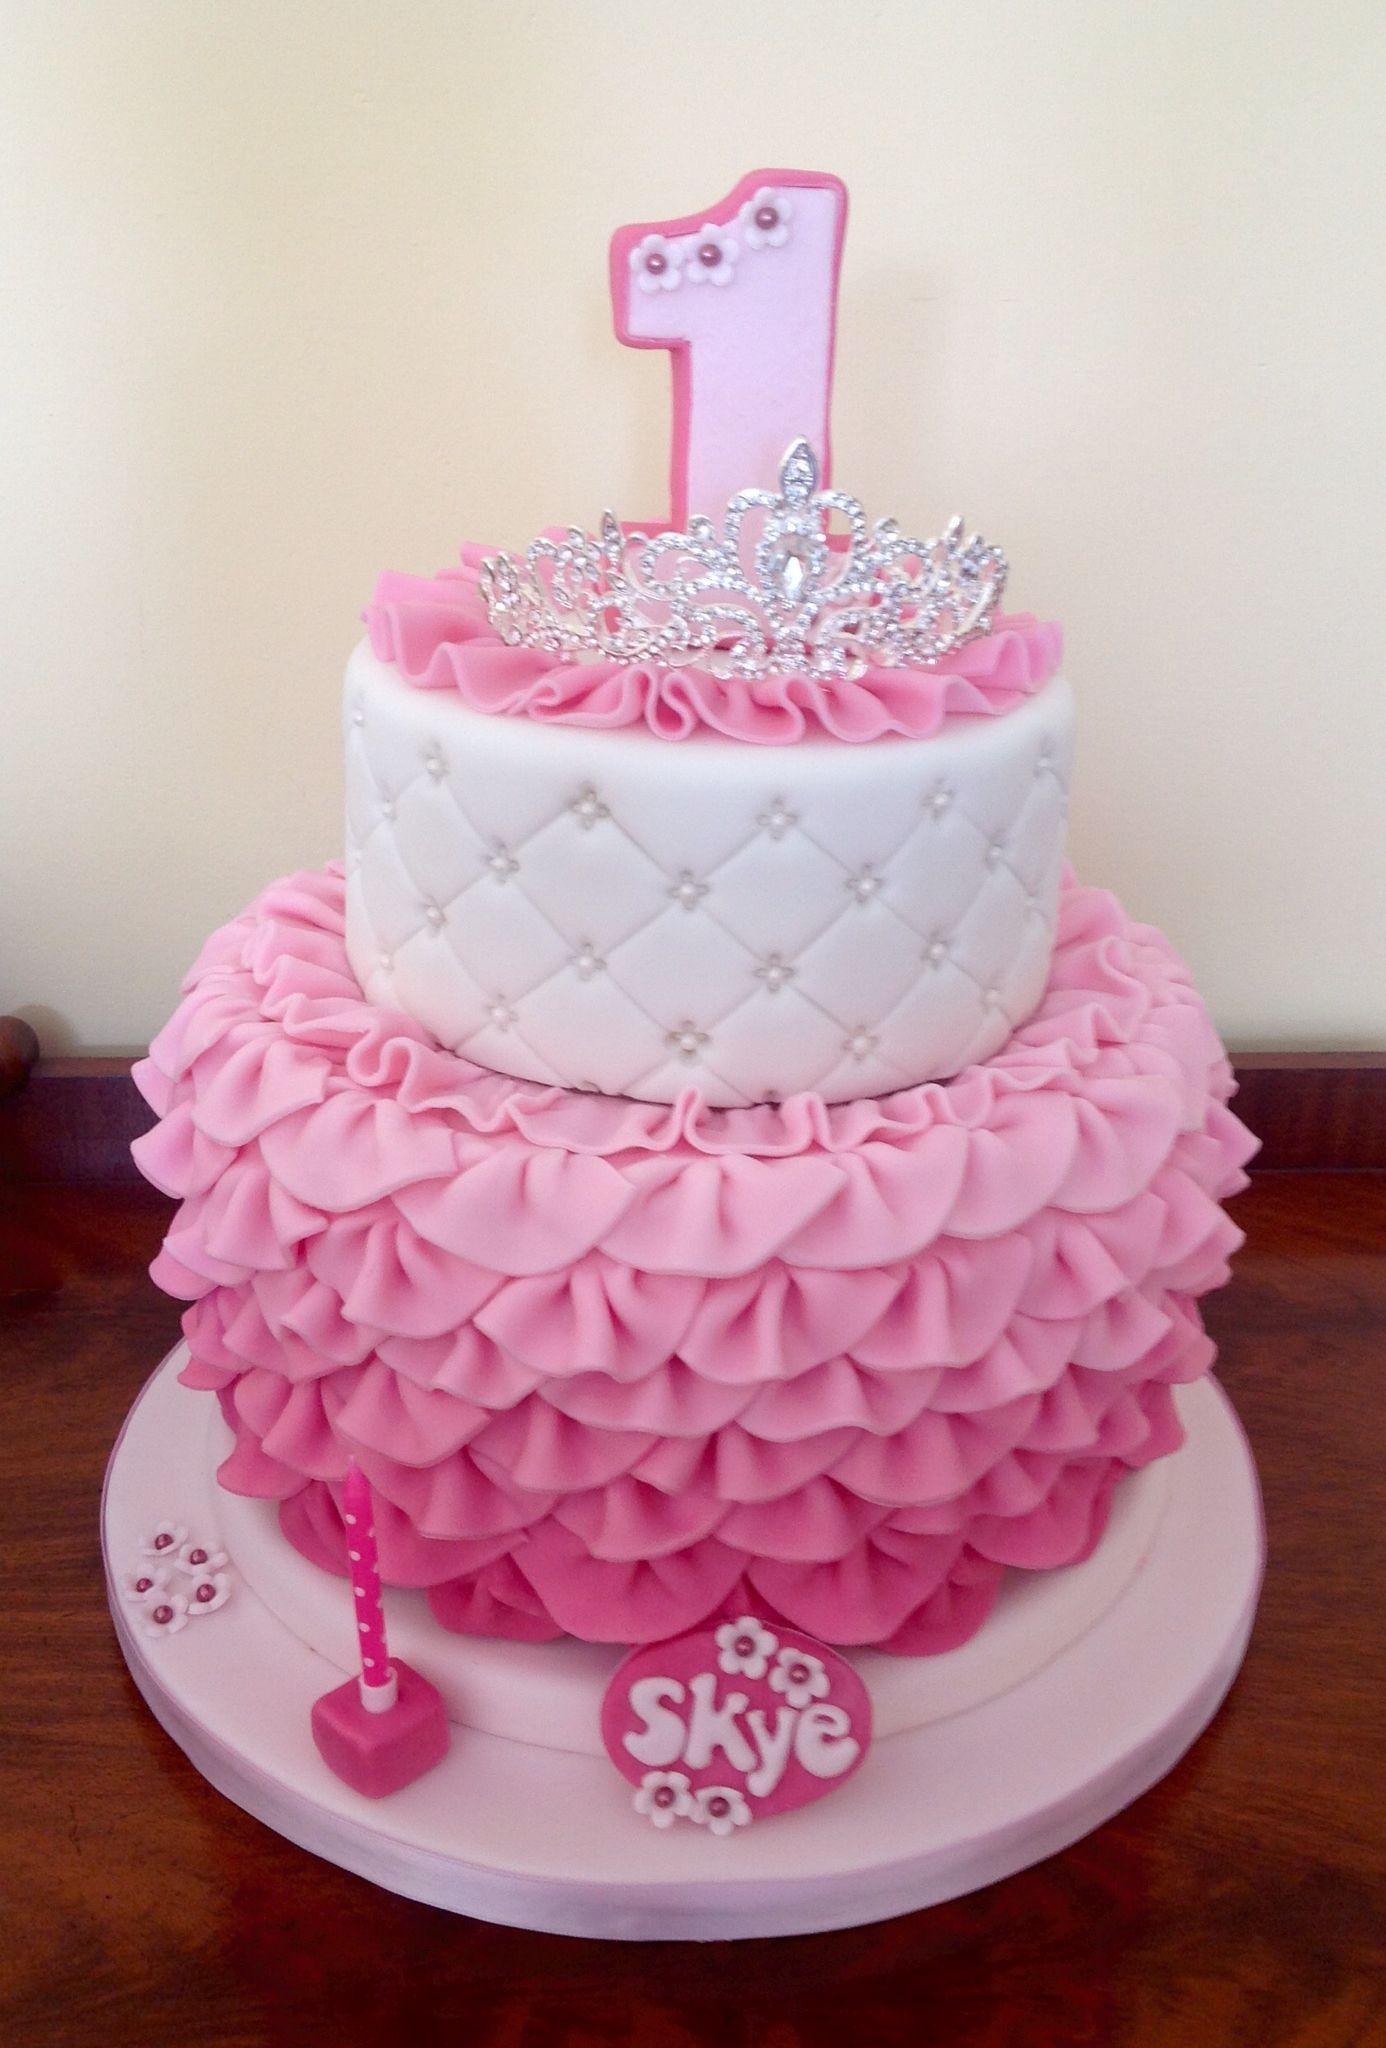 My Finished Creation Happy Birthday Skye Baby 1st